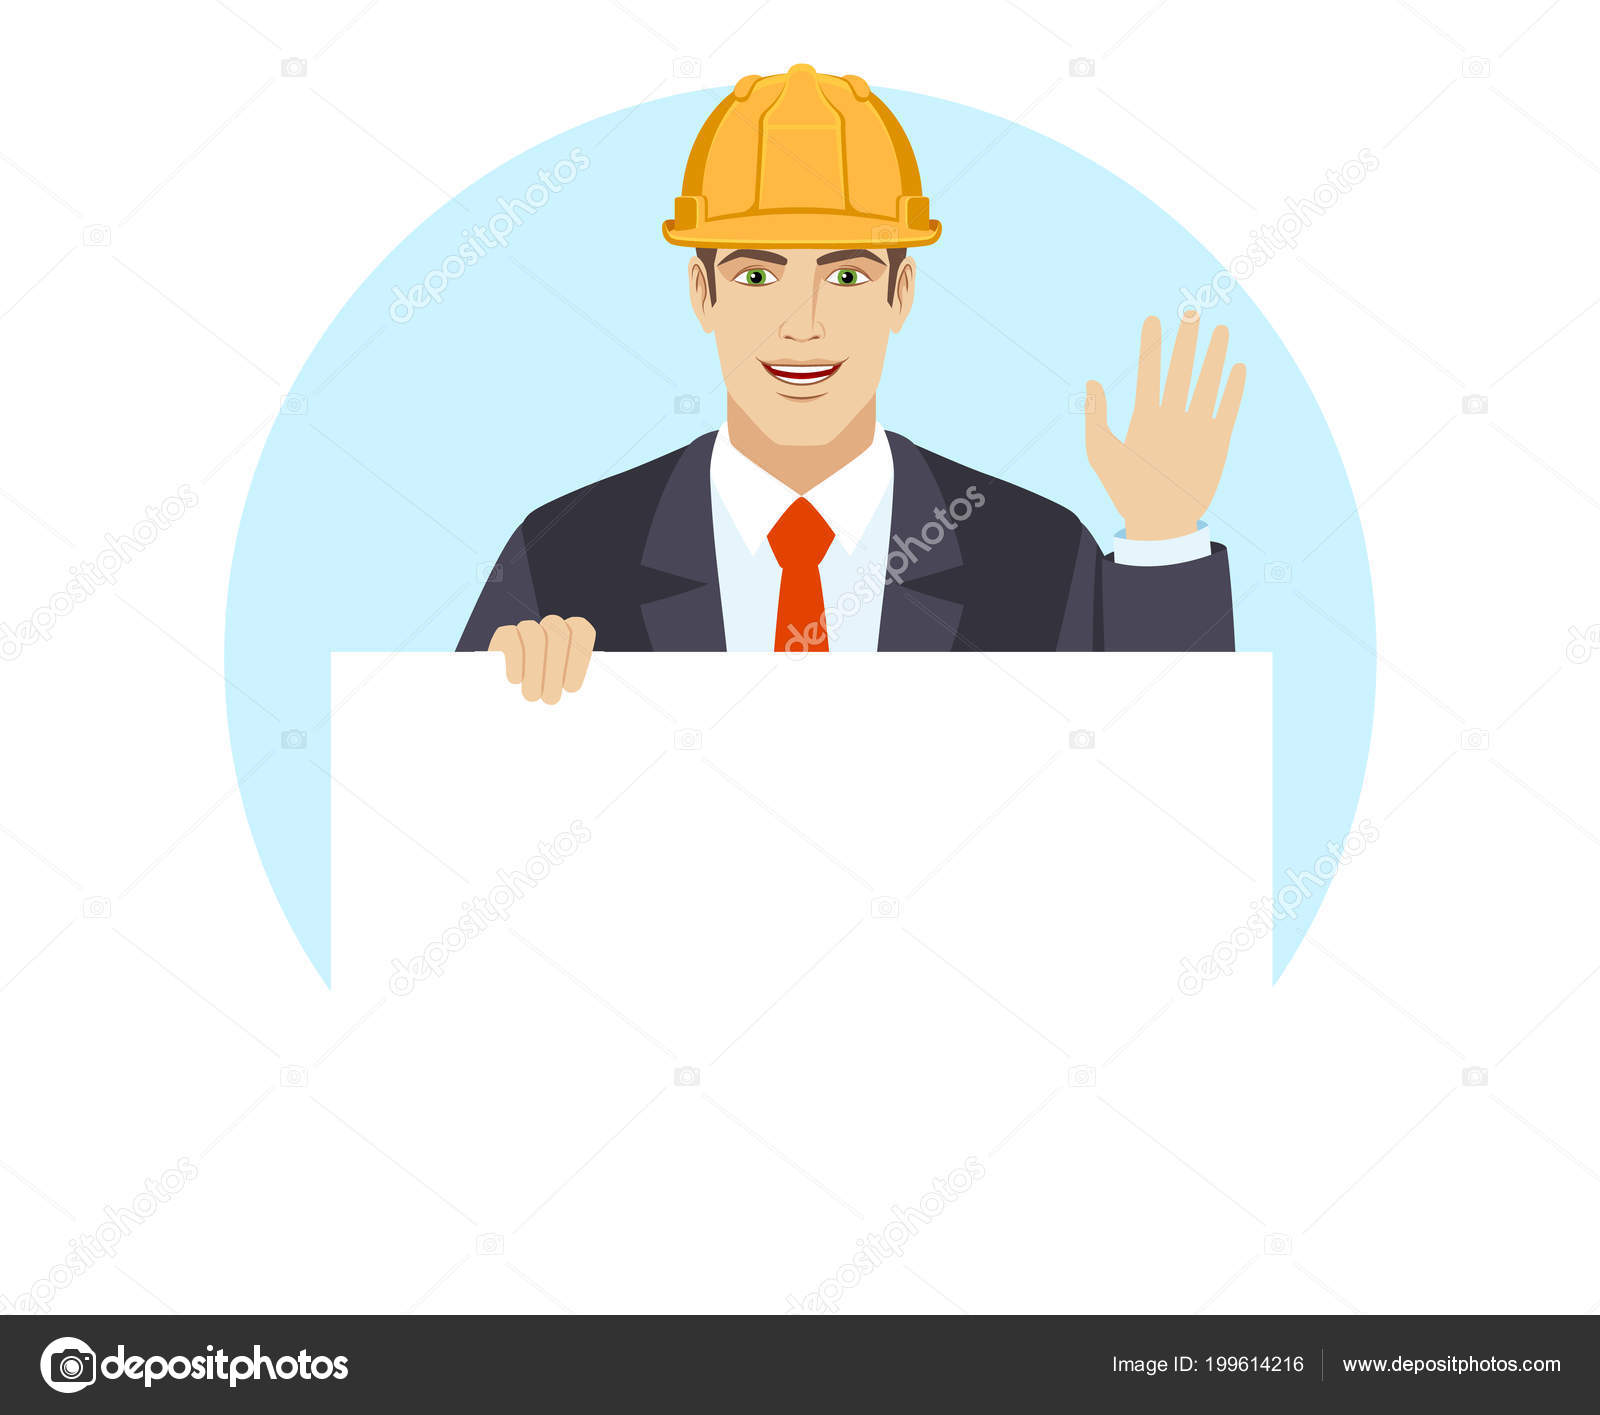 Businessman construction helmet holding white blank poster greeting businessman construction helmet holding white blank poster greeting someone his stock vector m4hsunfo